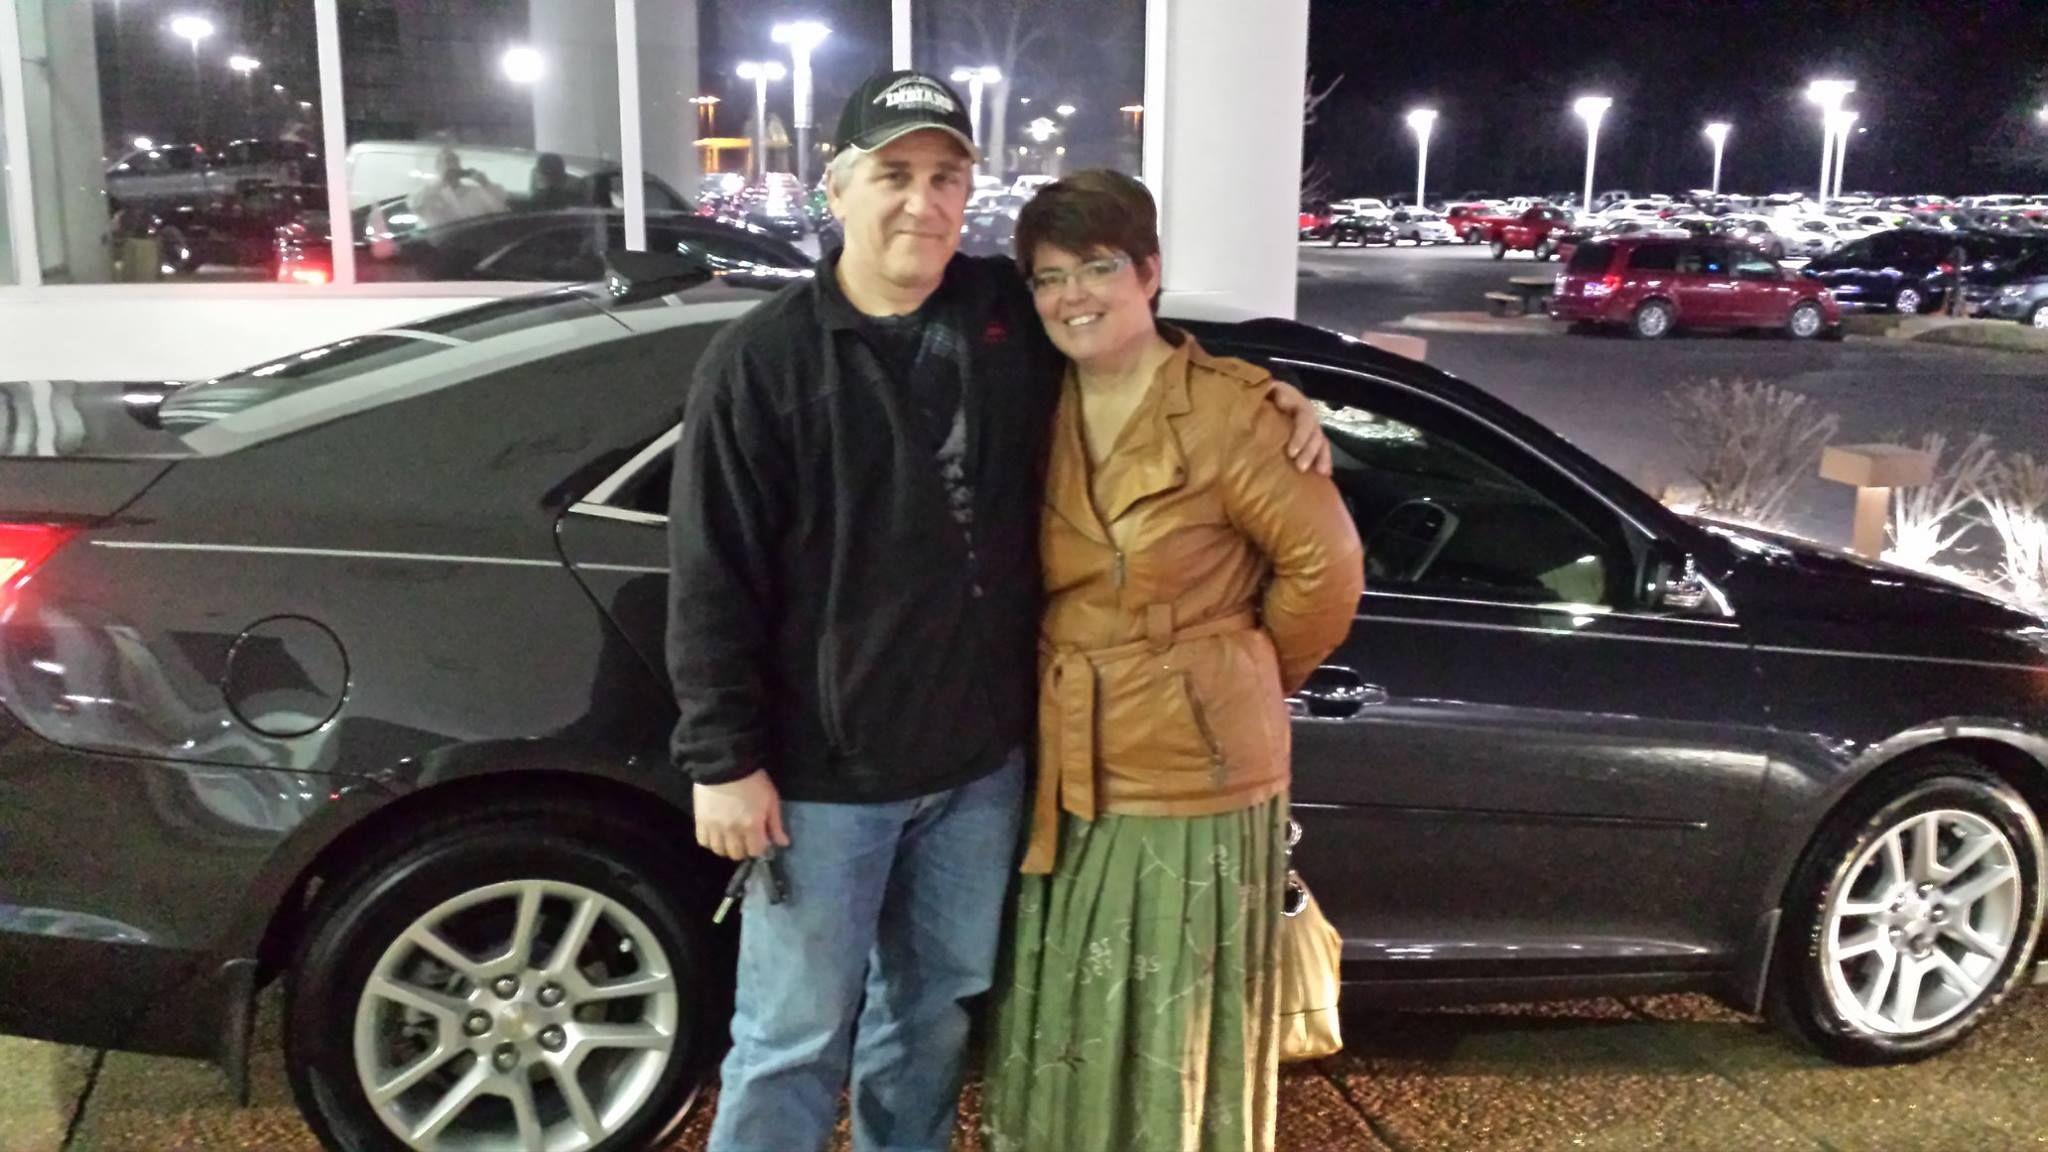 Mildred Smith and Kurt Kirchner are set to enjoy their new Chevrolet